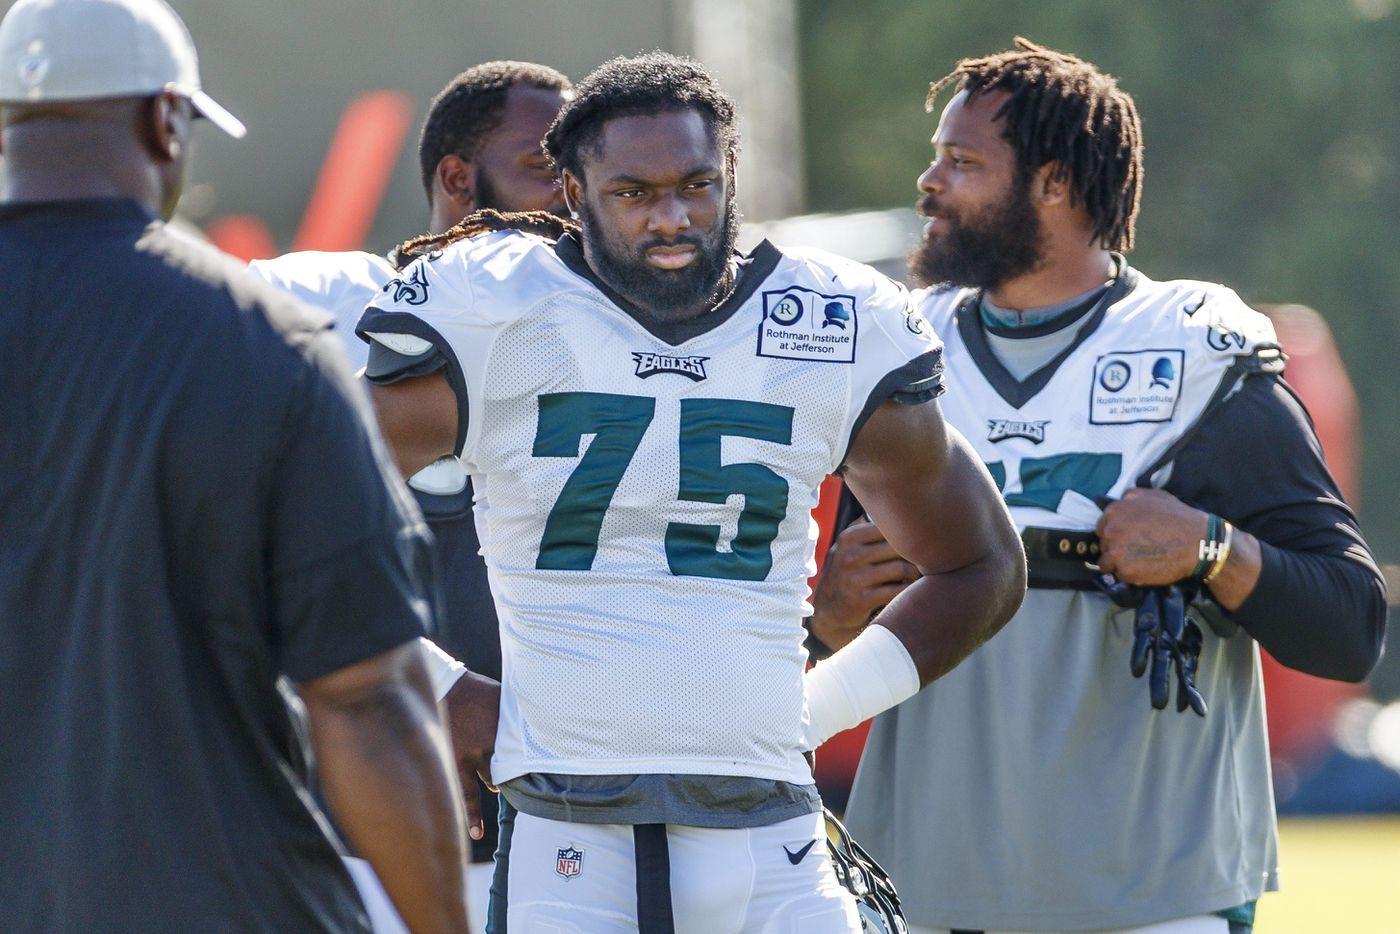 Josh Sweat survives scare, looks to build a future on Eagles' defensive line